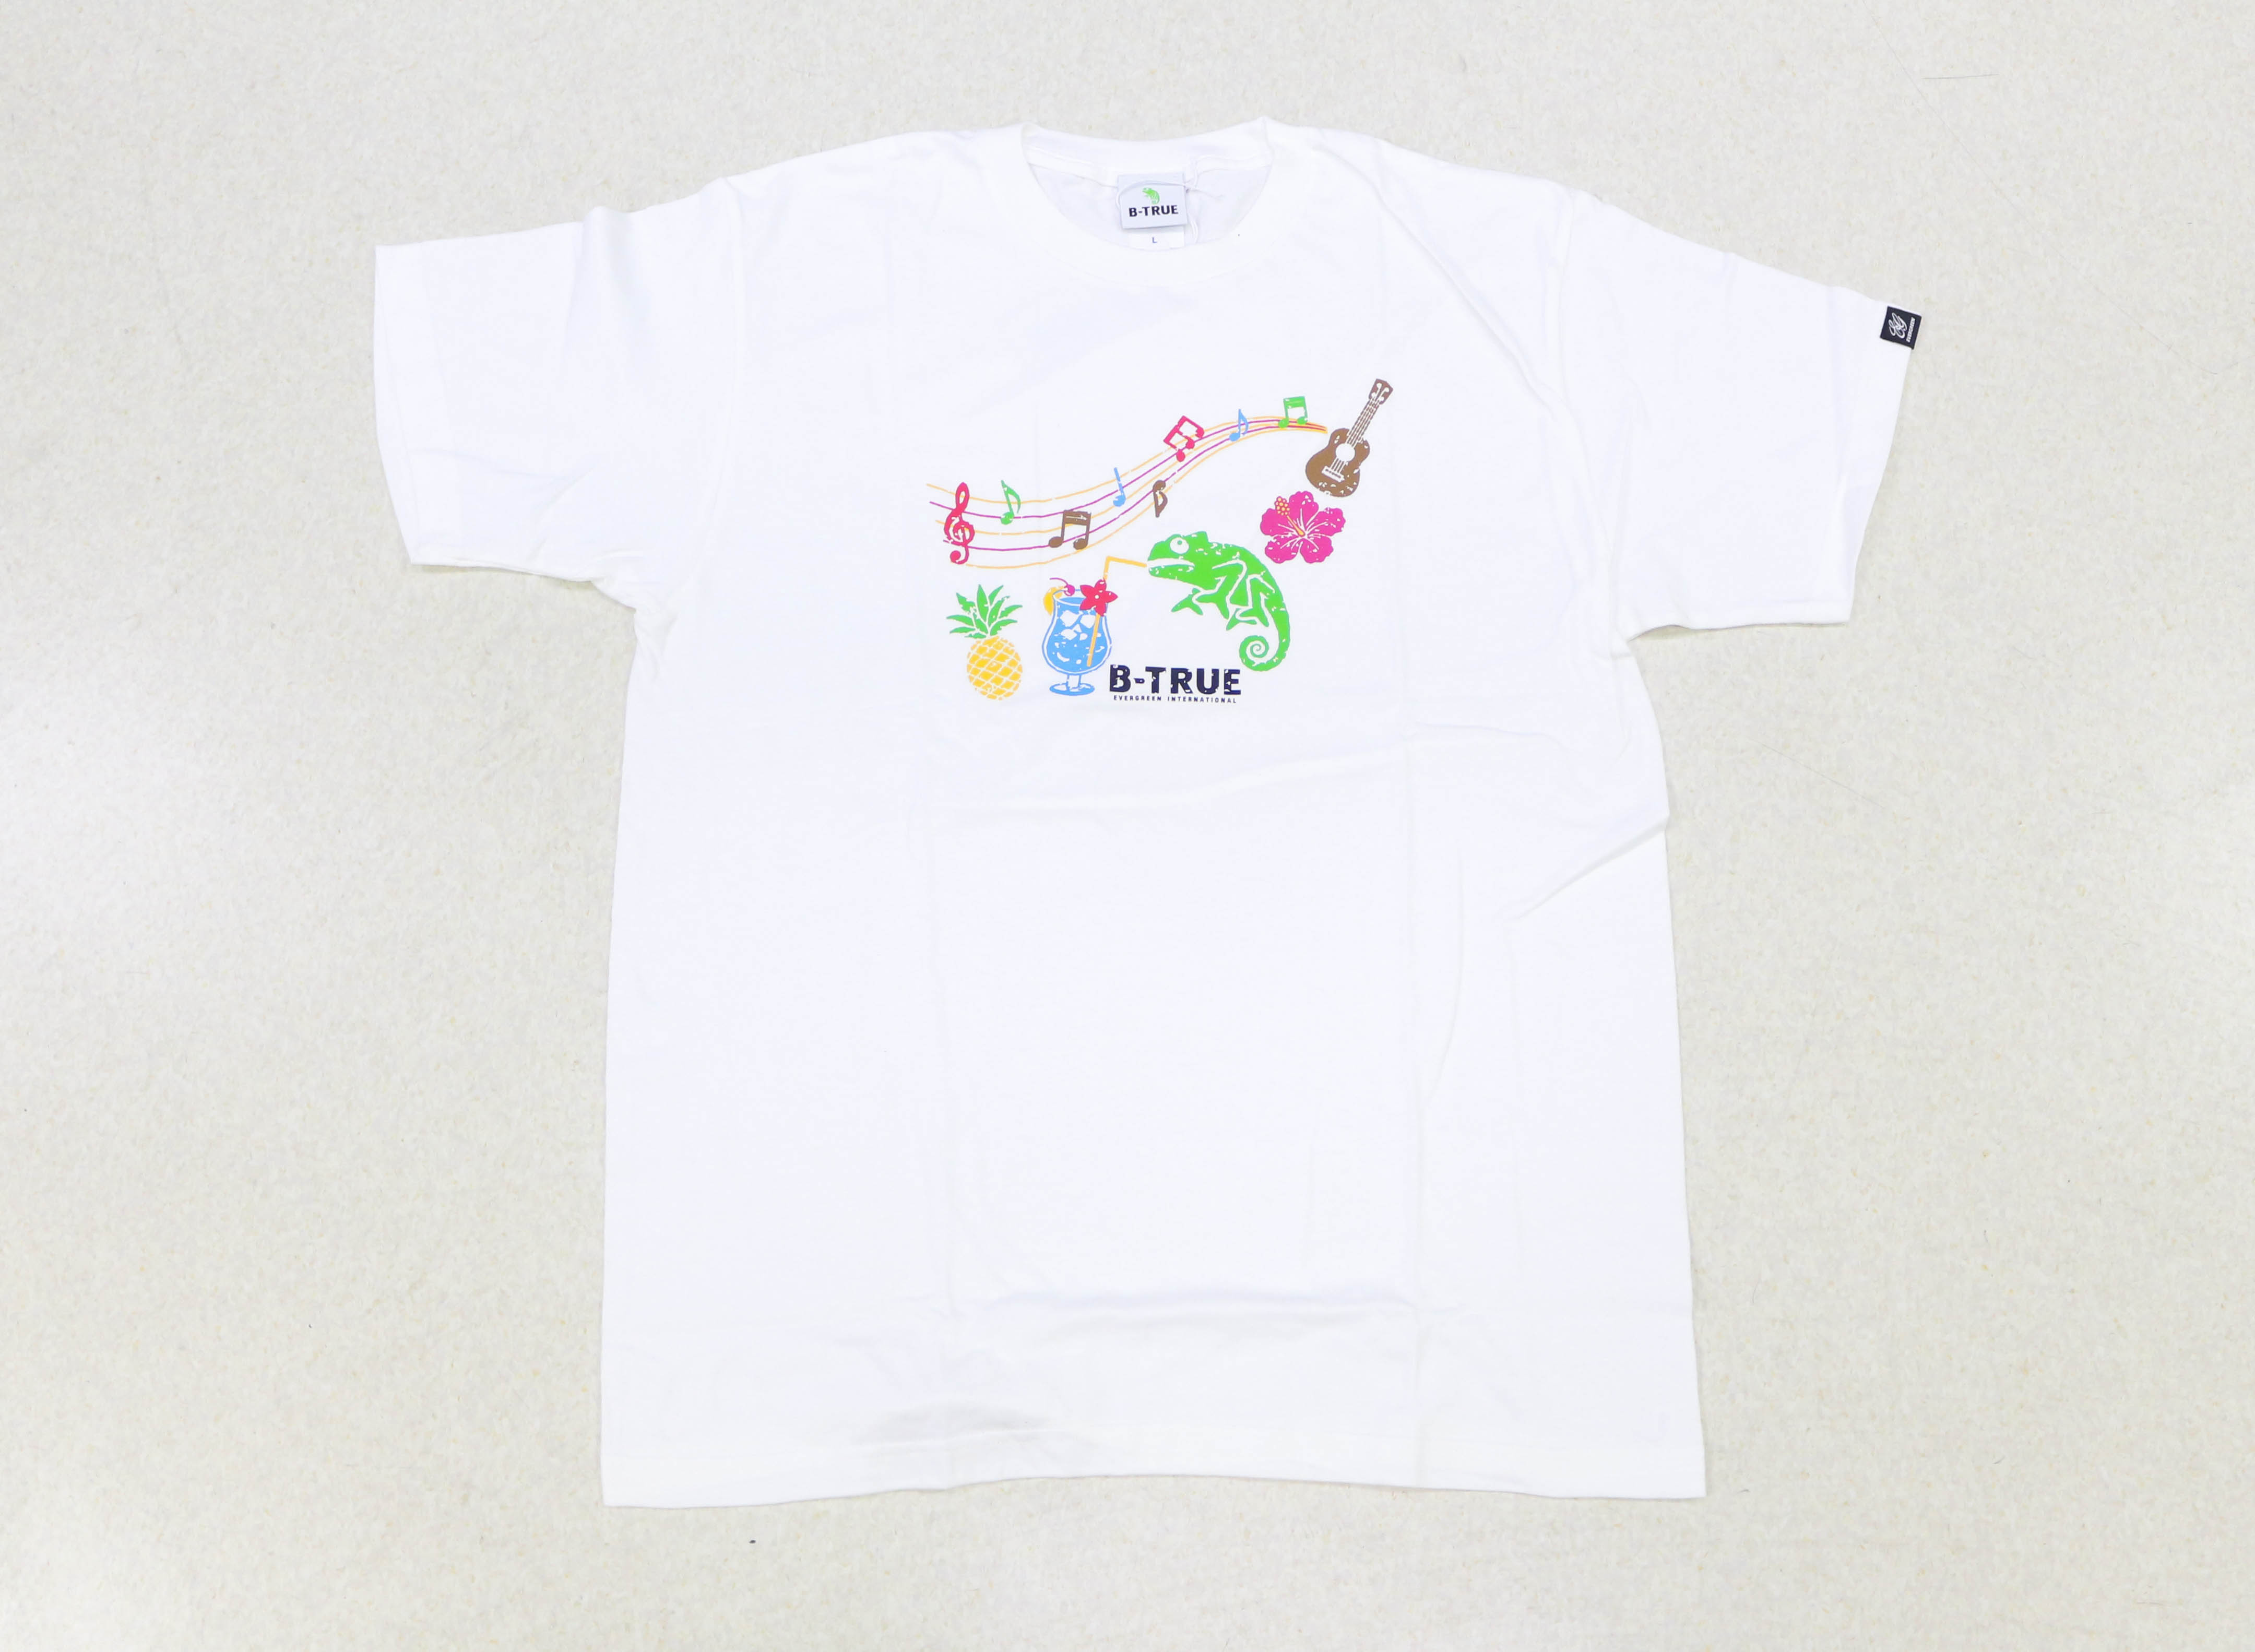 Evergreen T-Shirt Short Sleeve Type 1 Size L White (0748)